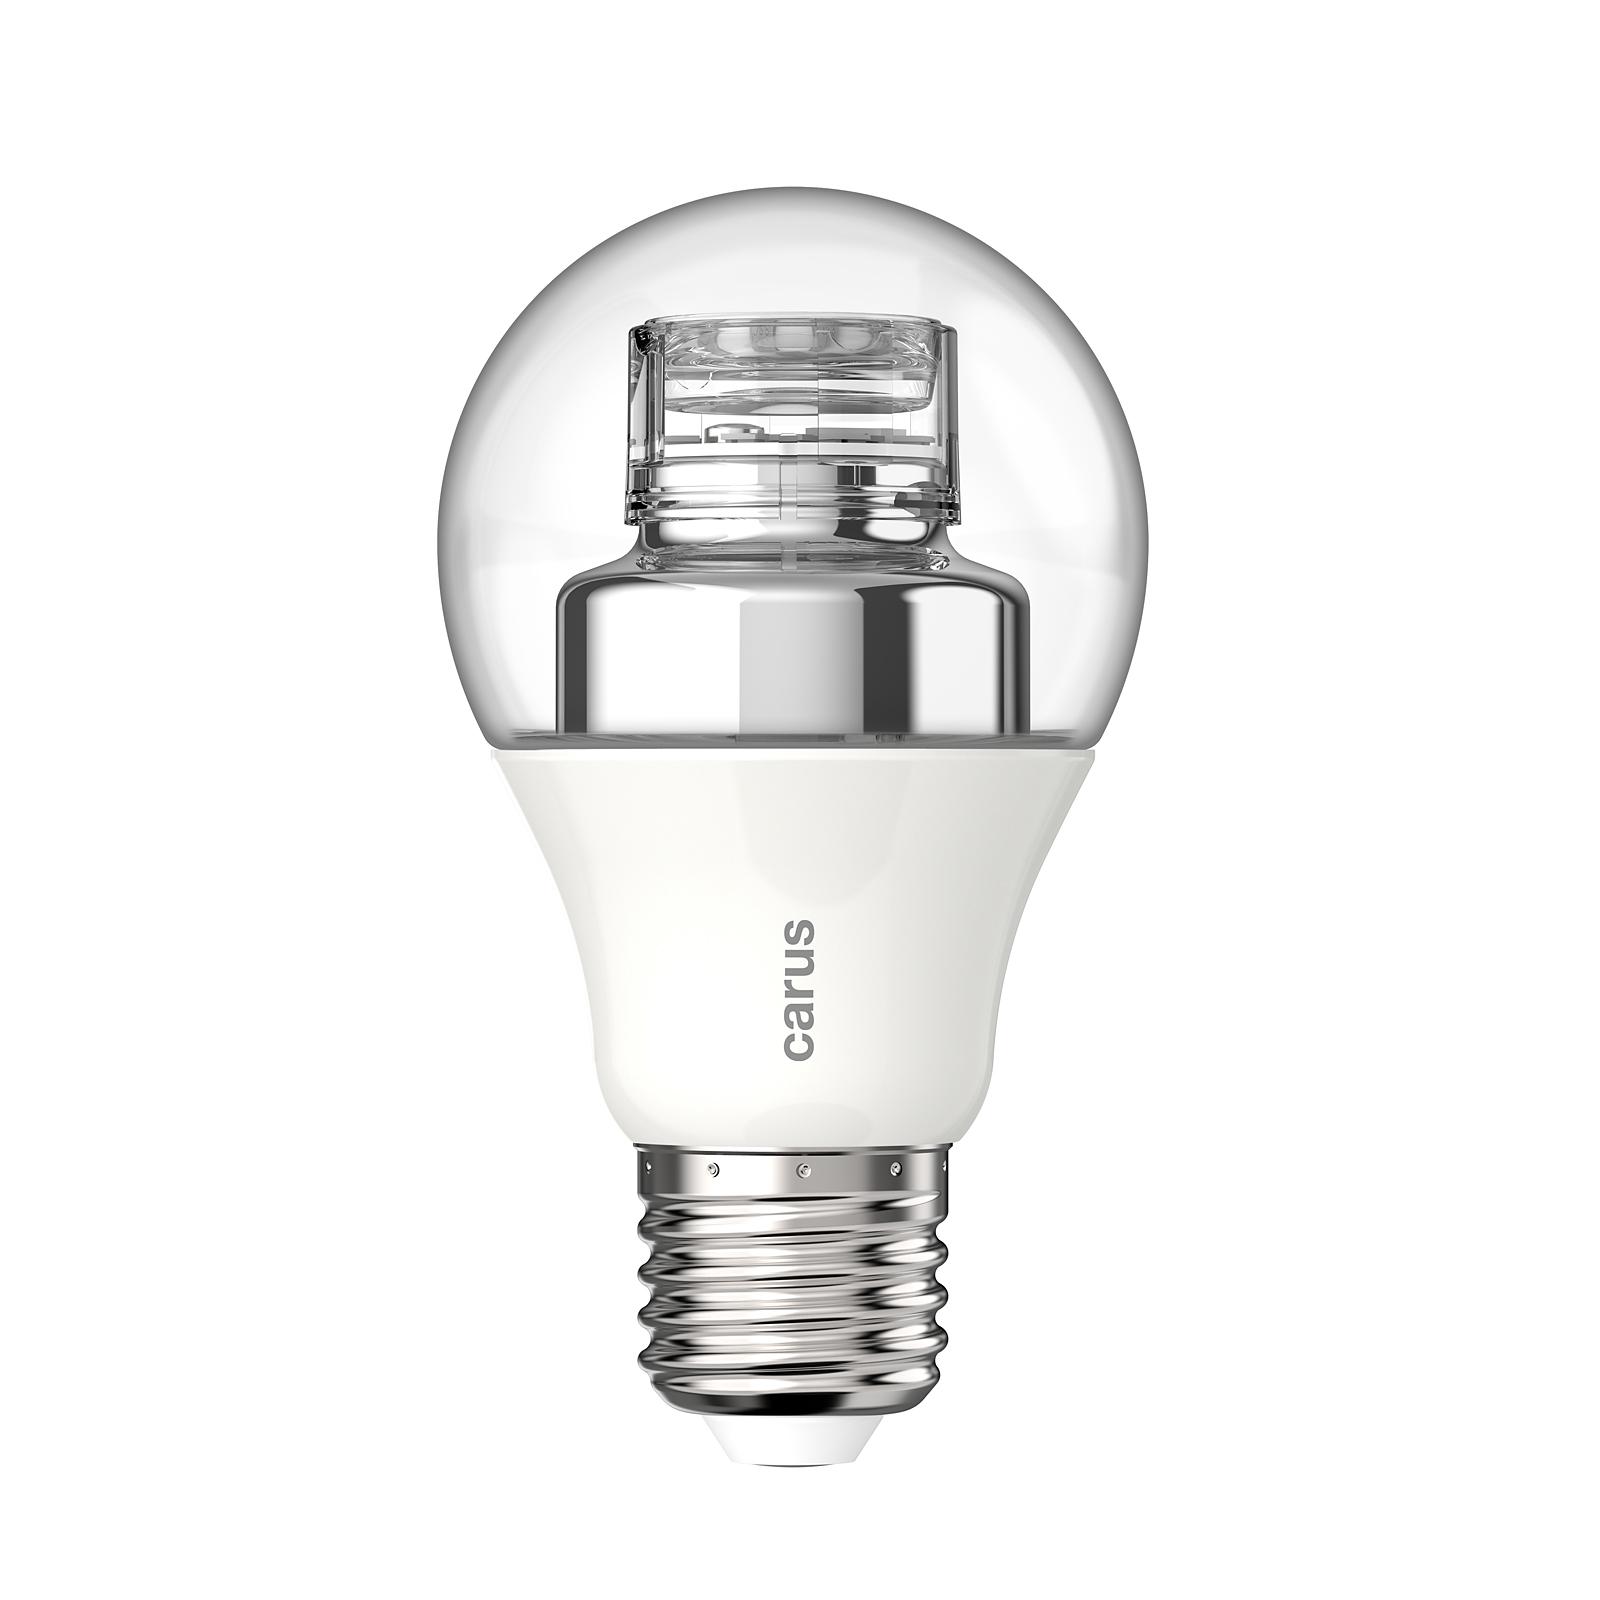 10880-CARUS-DimbyClick-LED-Lampe-8W-E27-600lm-48W-warmweiss-dimmbar-per-Lichtschalter-1 Wunderschöne Led Leuchtmittel E27 1000 Lumen Dekorationen